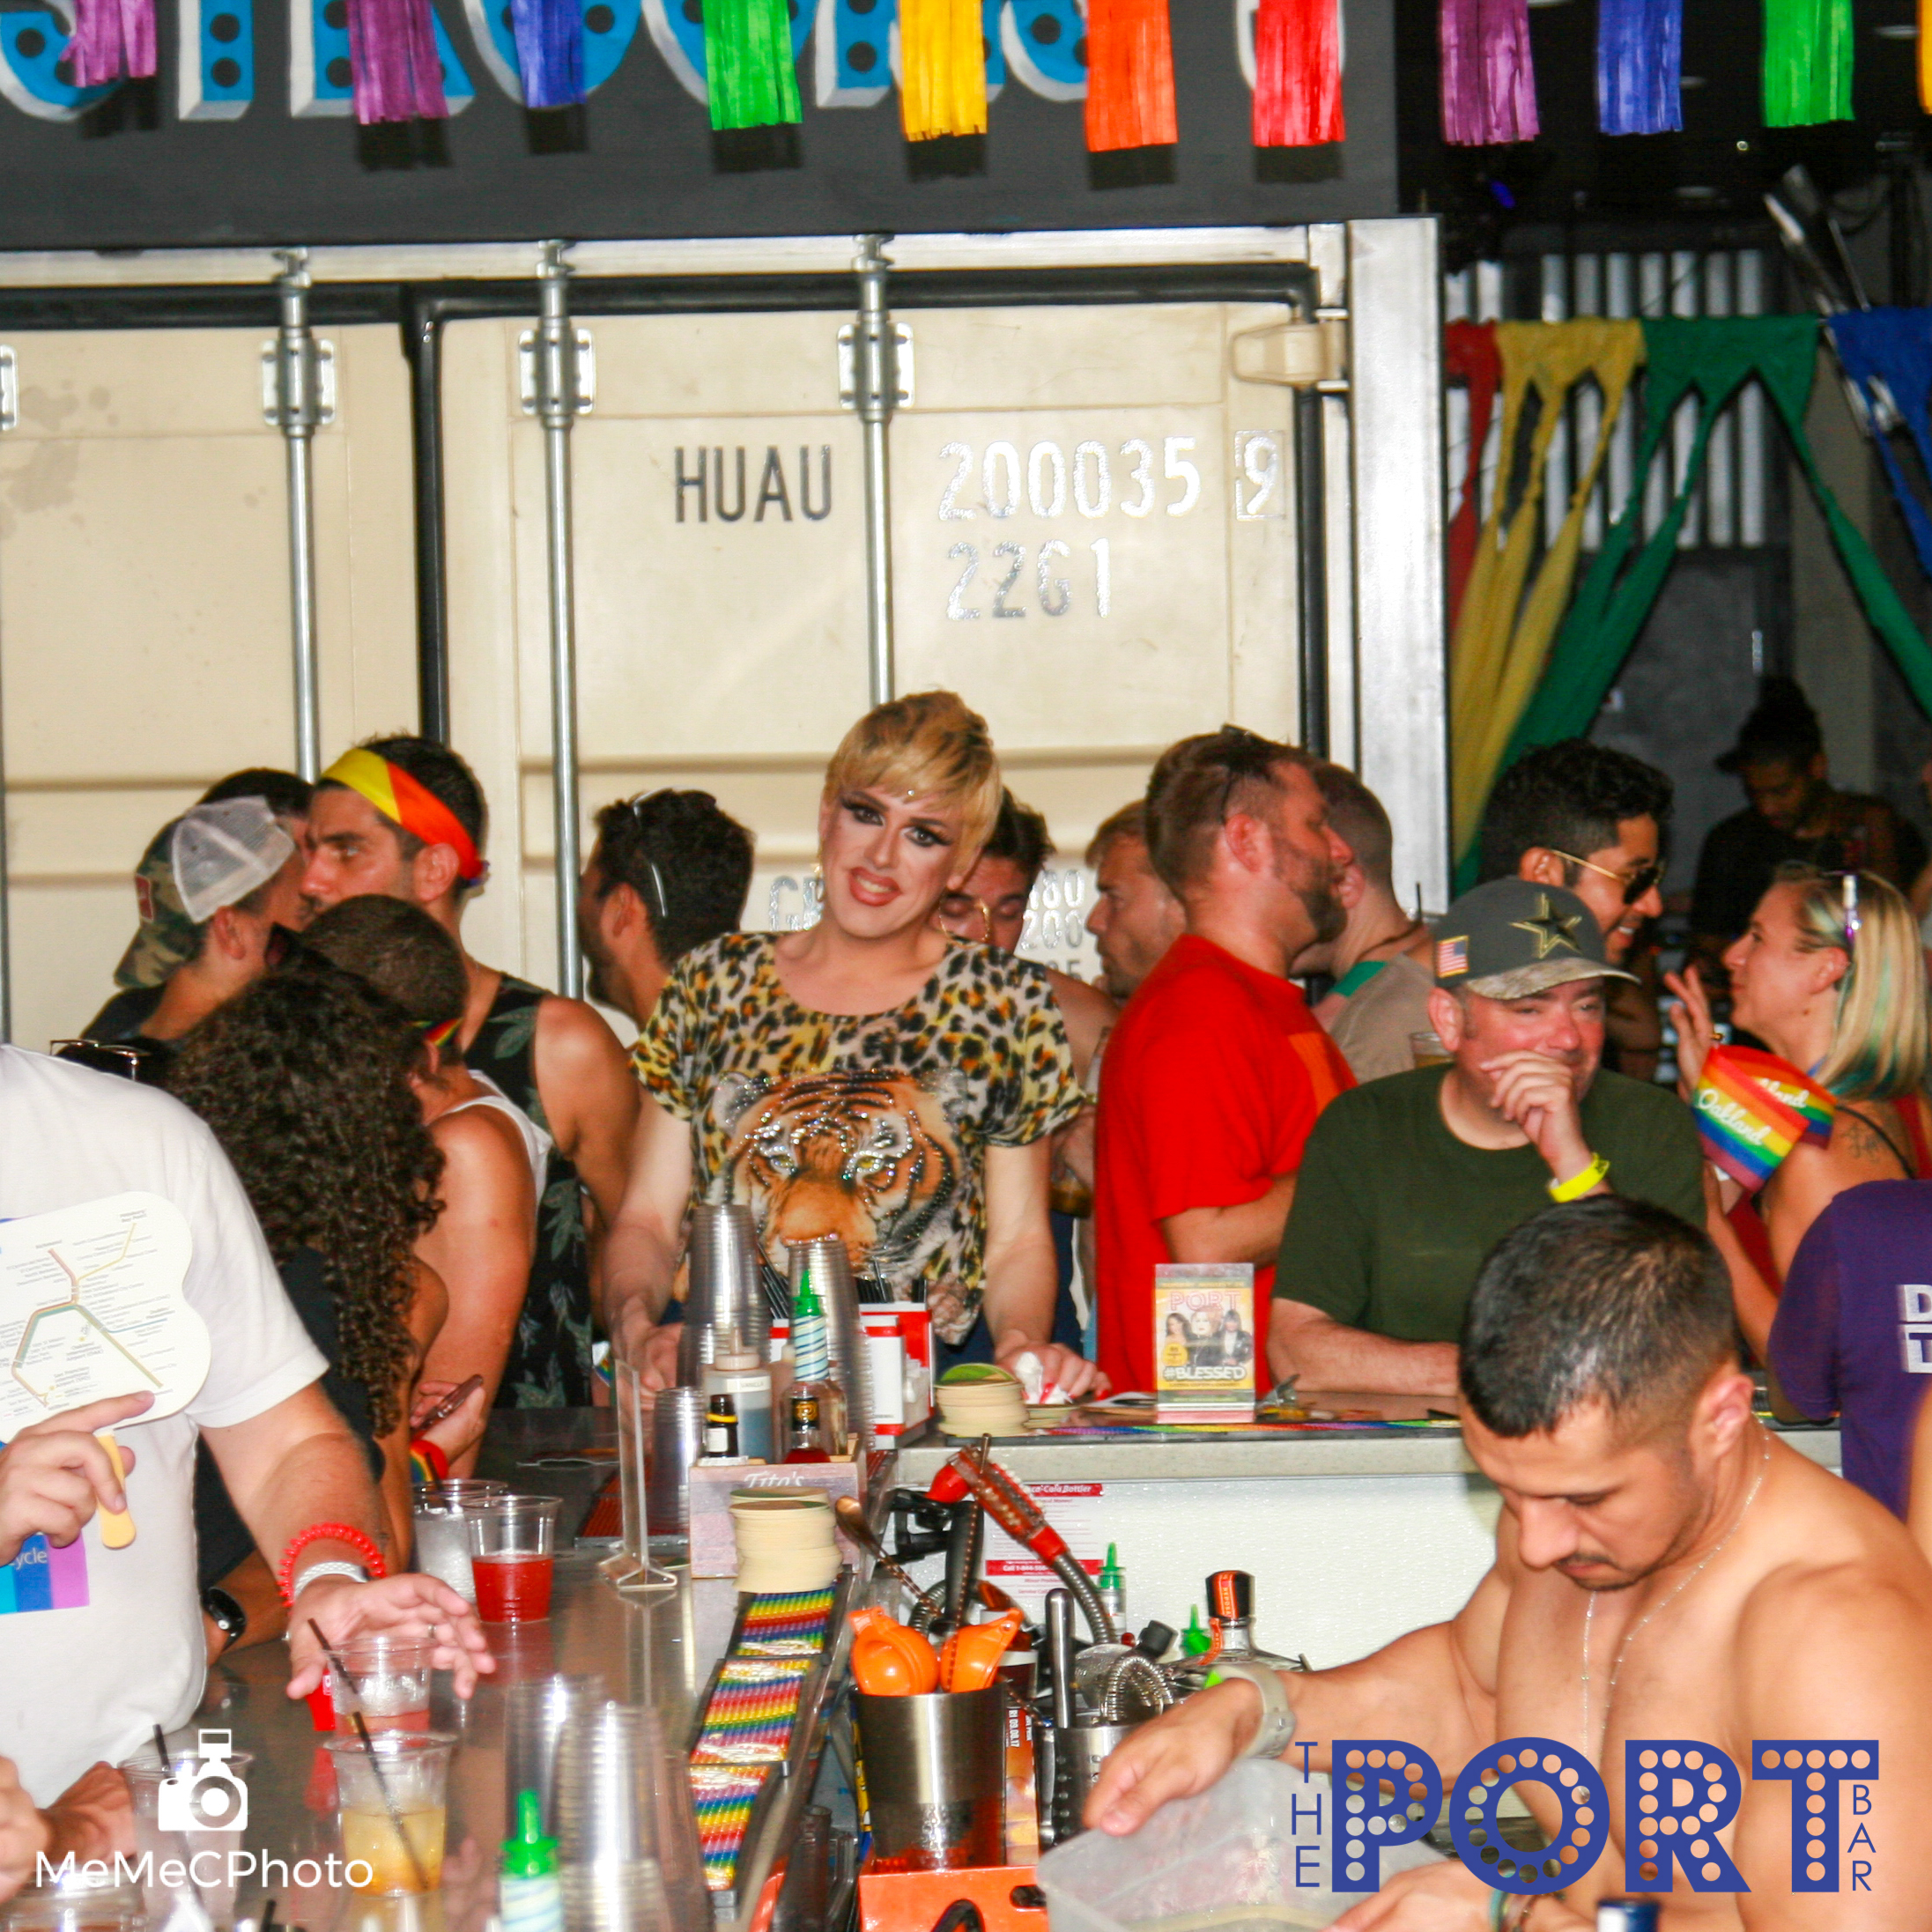 Port Bar Oakland Pride - Carnie Head On.jpg